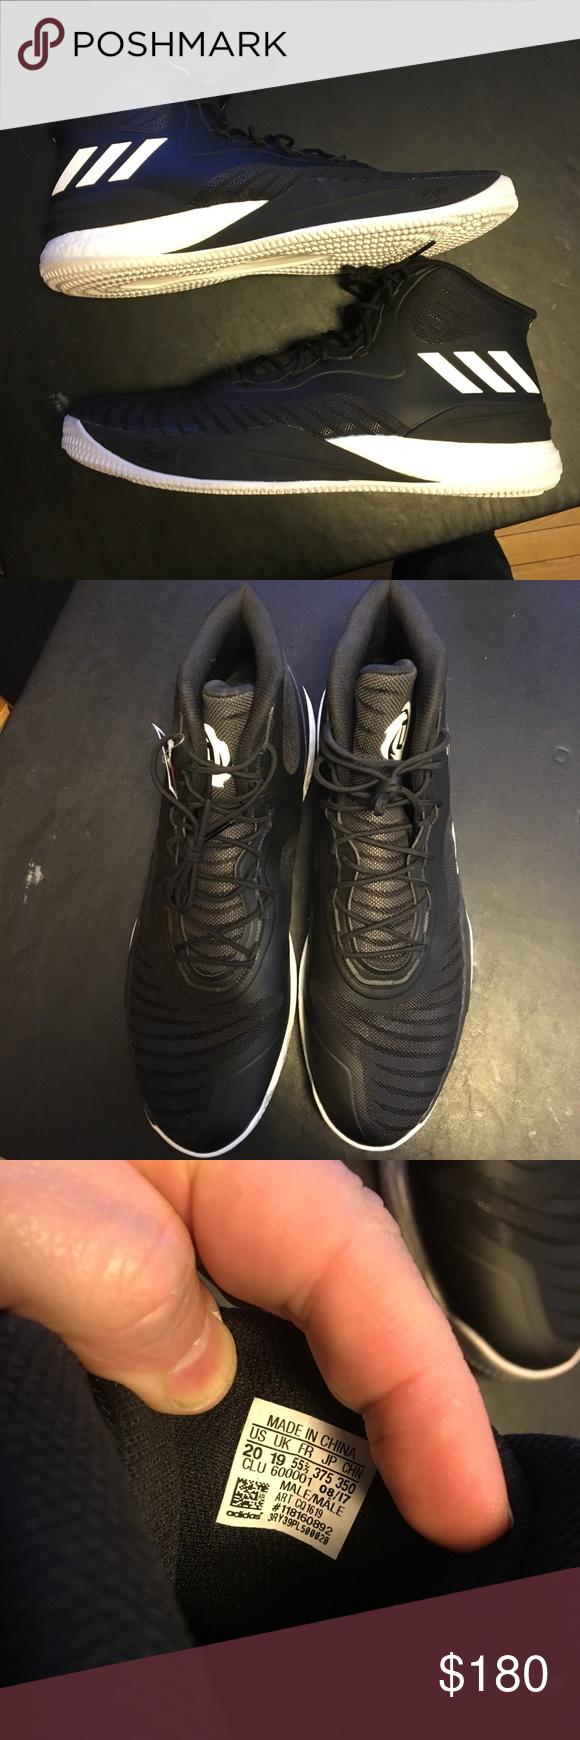 adidas Mens D Rose 8 Boost Basketball Shoes CQ1619 Black White Derrick Rose